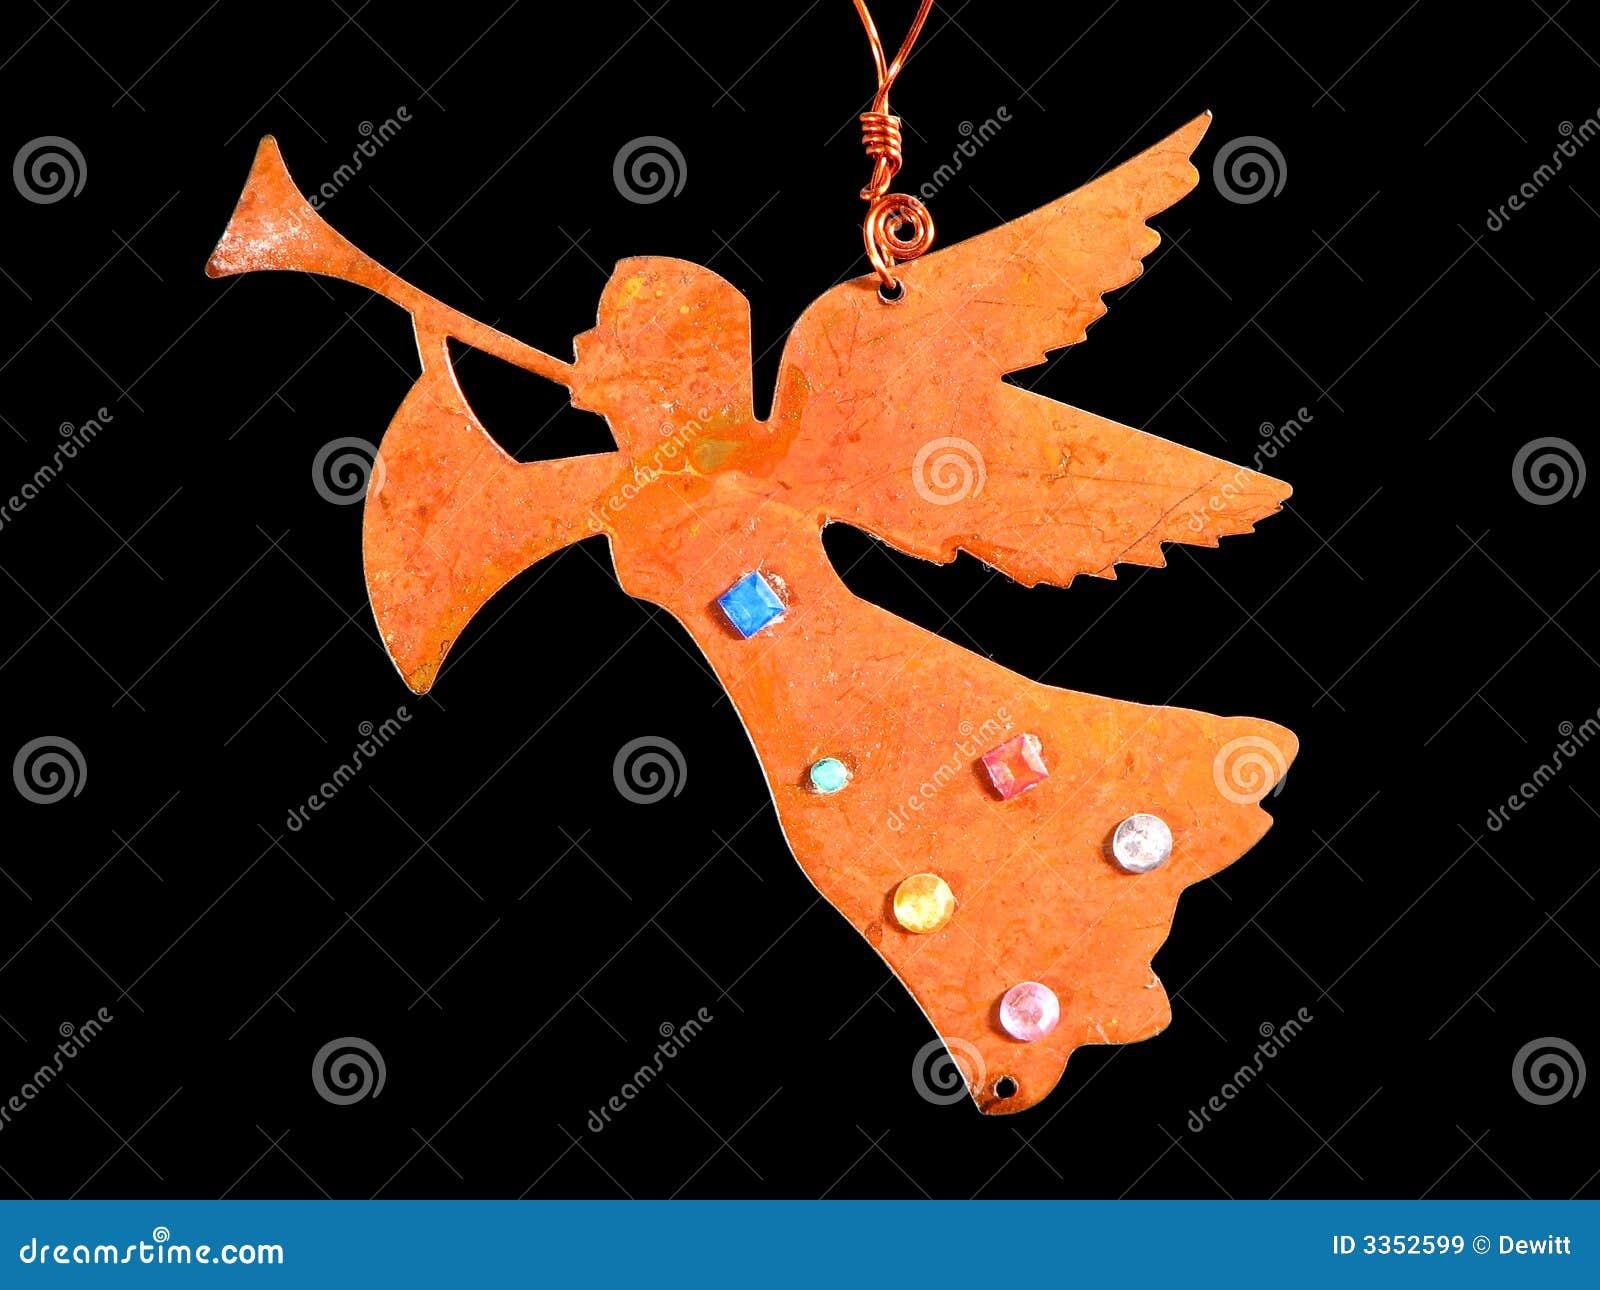 christmas tree angel ornament - Angel Christmas Tree Ornaments